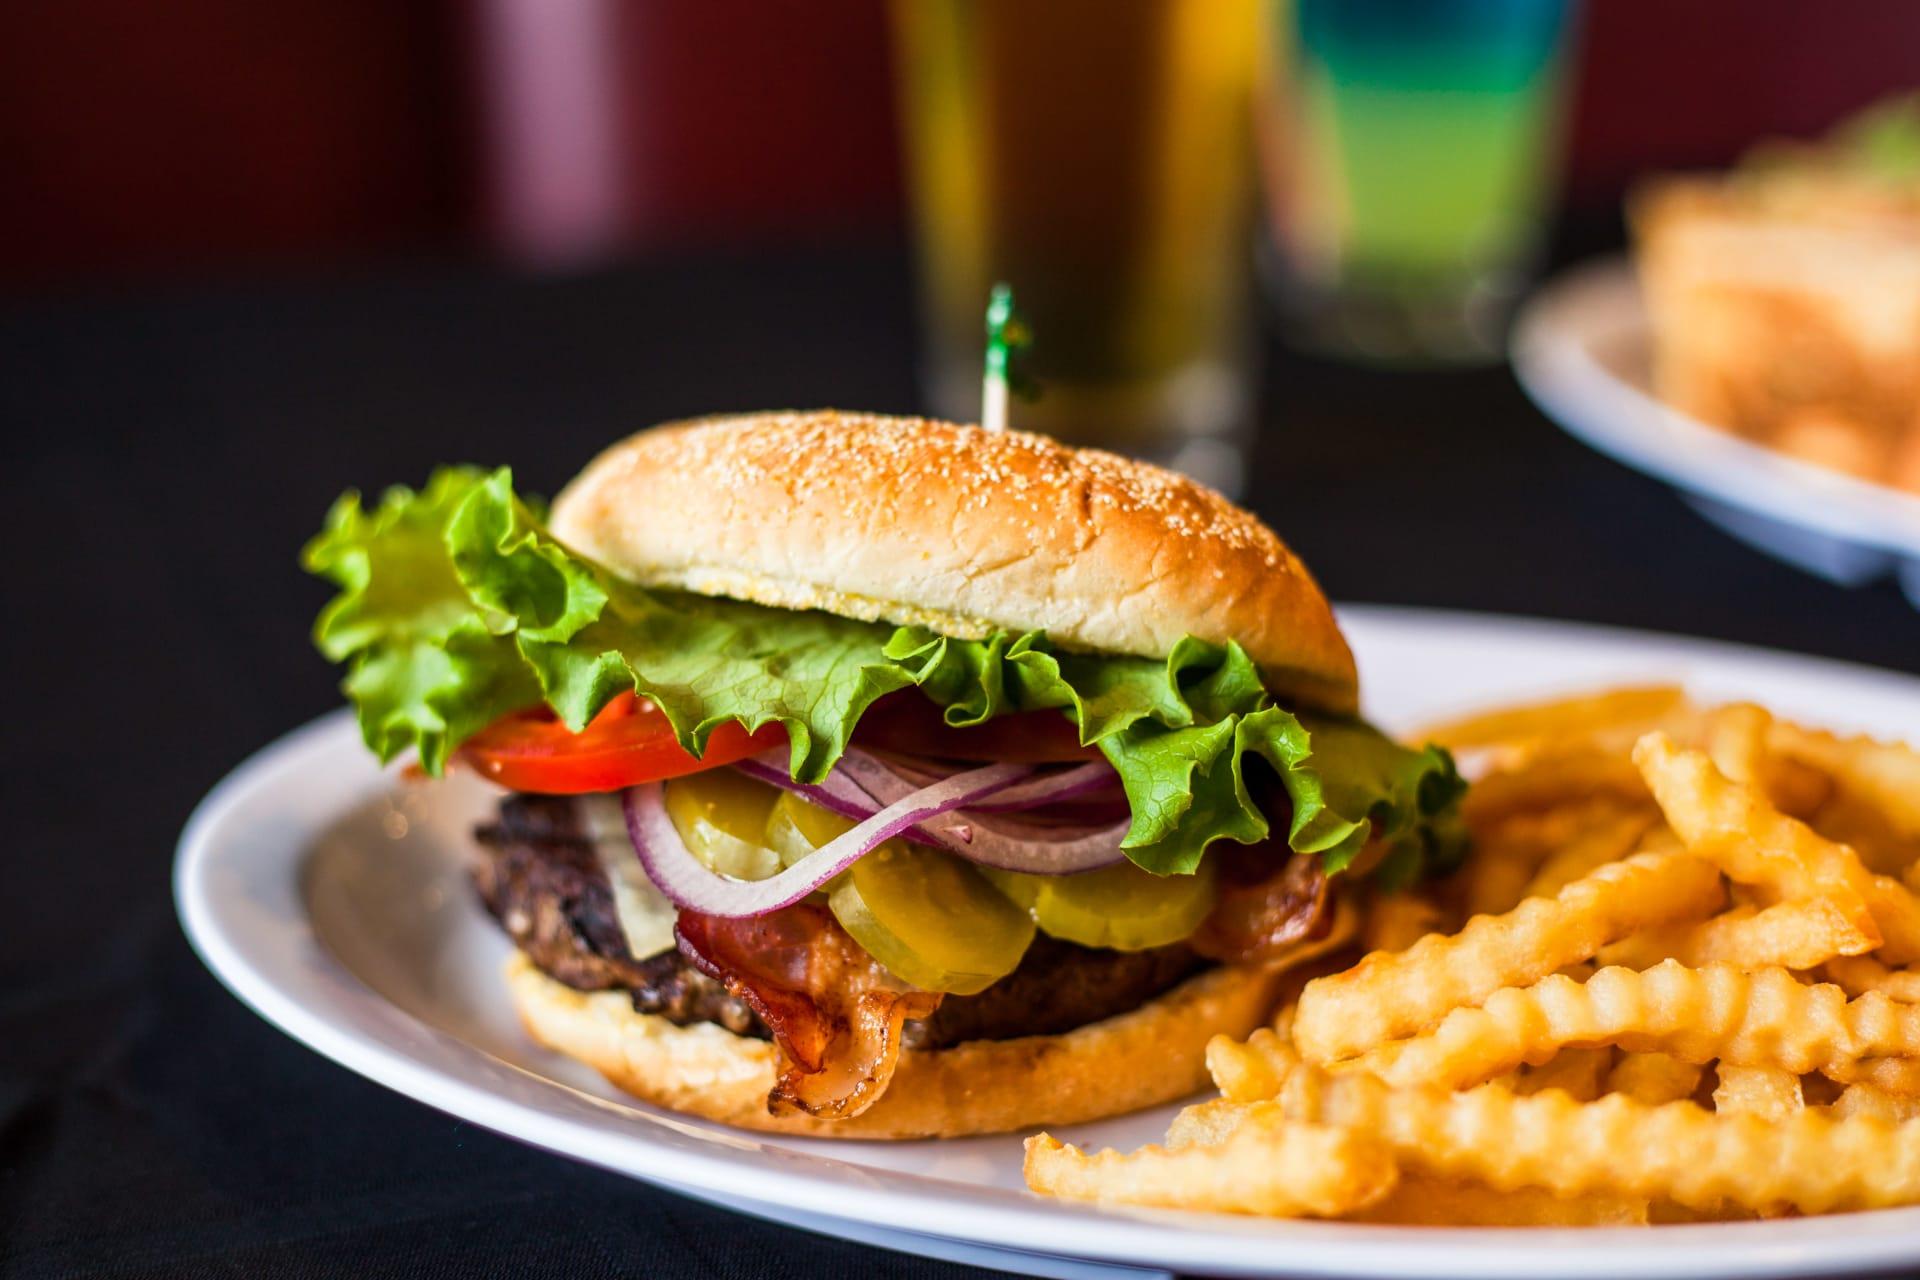 The Beast Burger